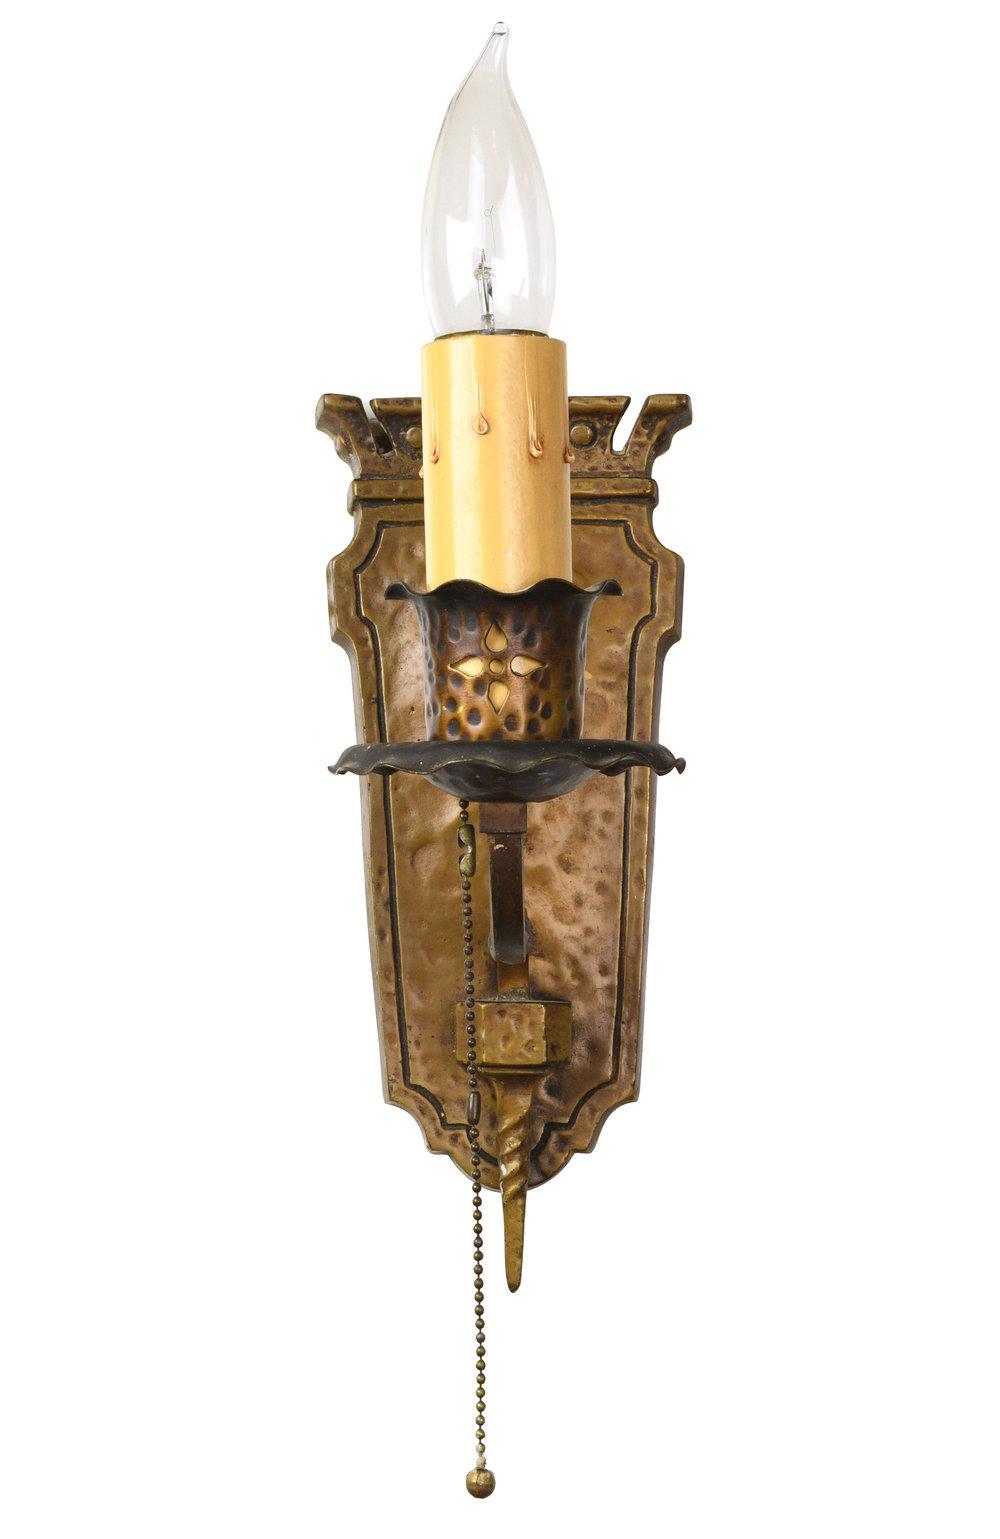 47985-cast-brass-tudor-sconce-straight-view.jpg